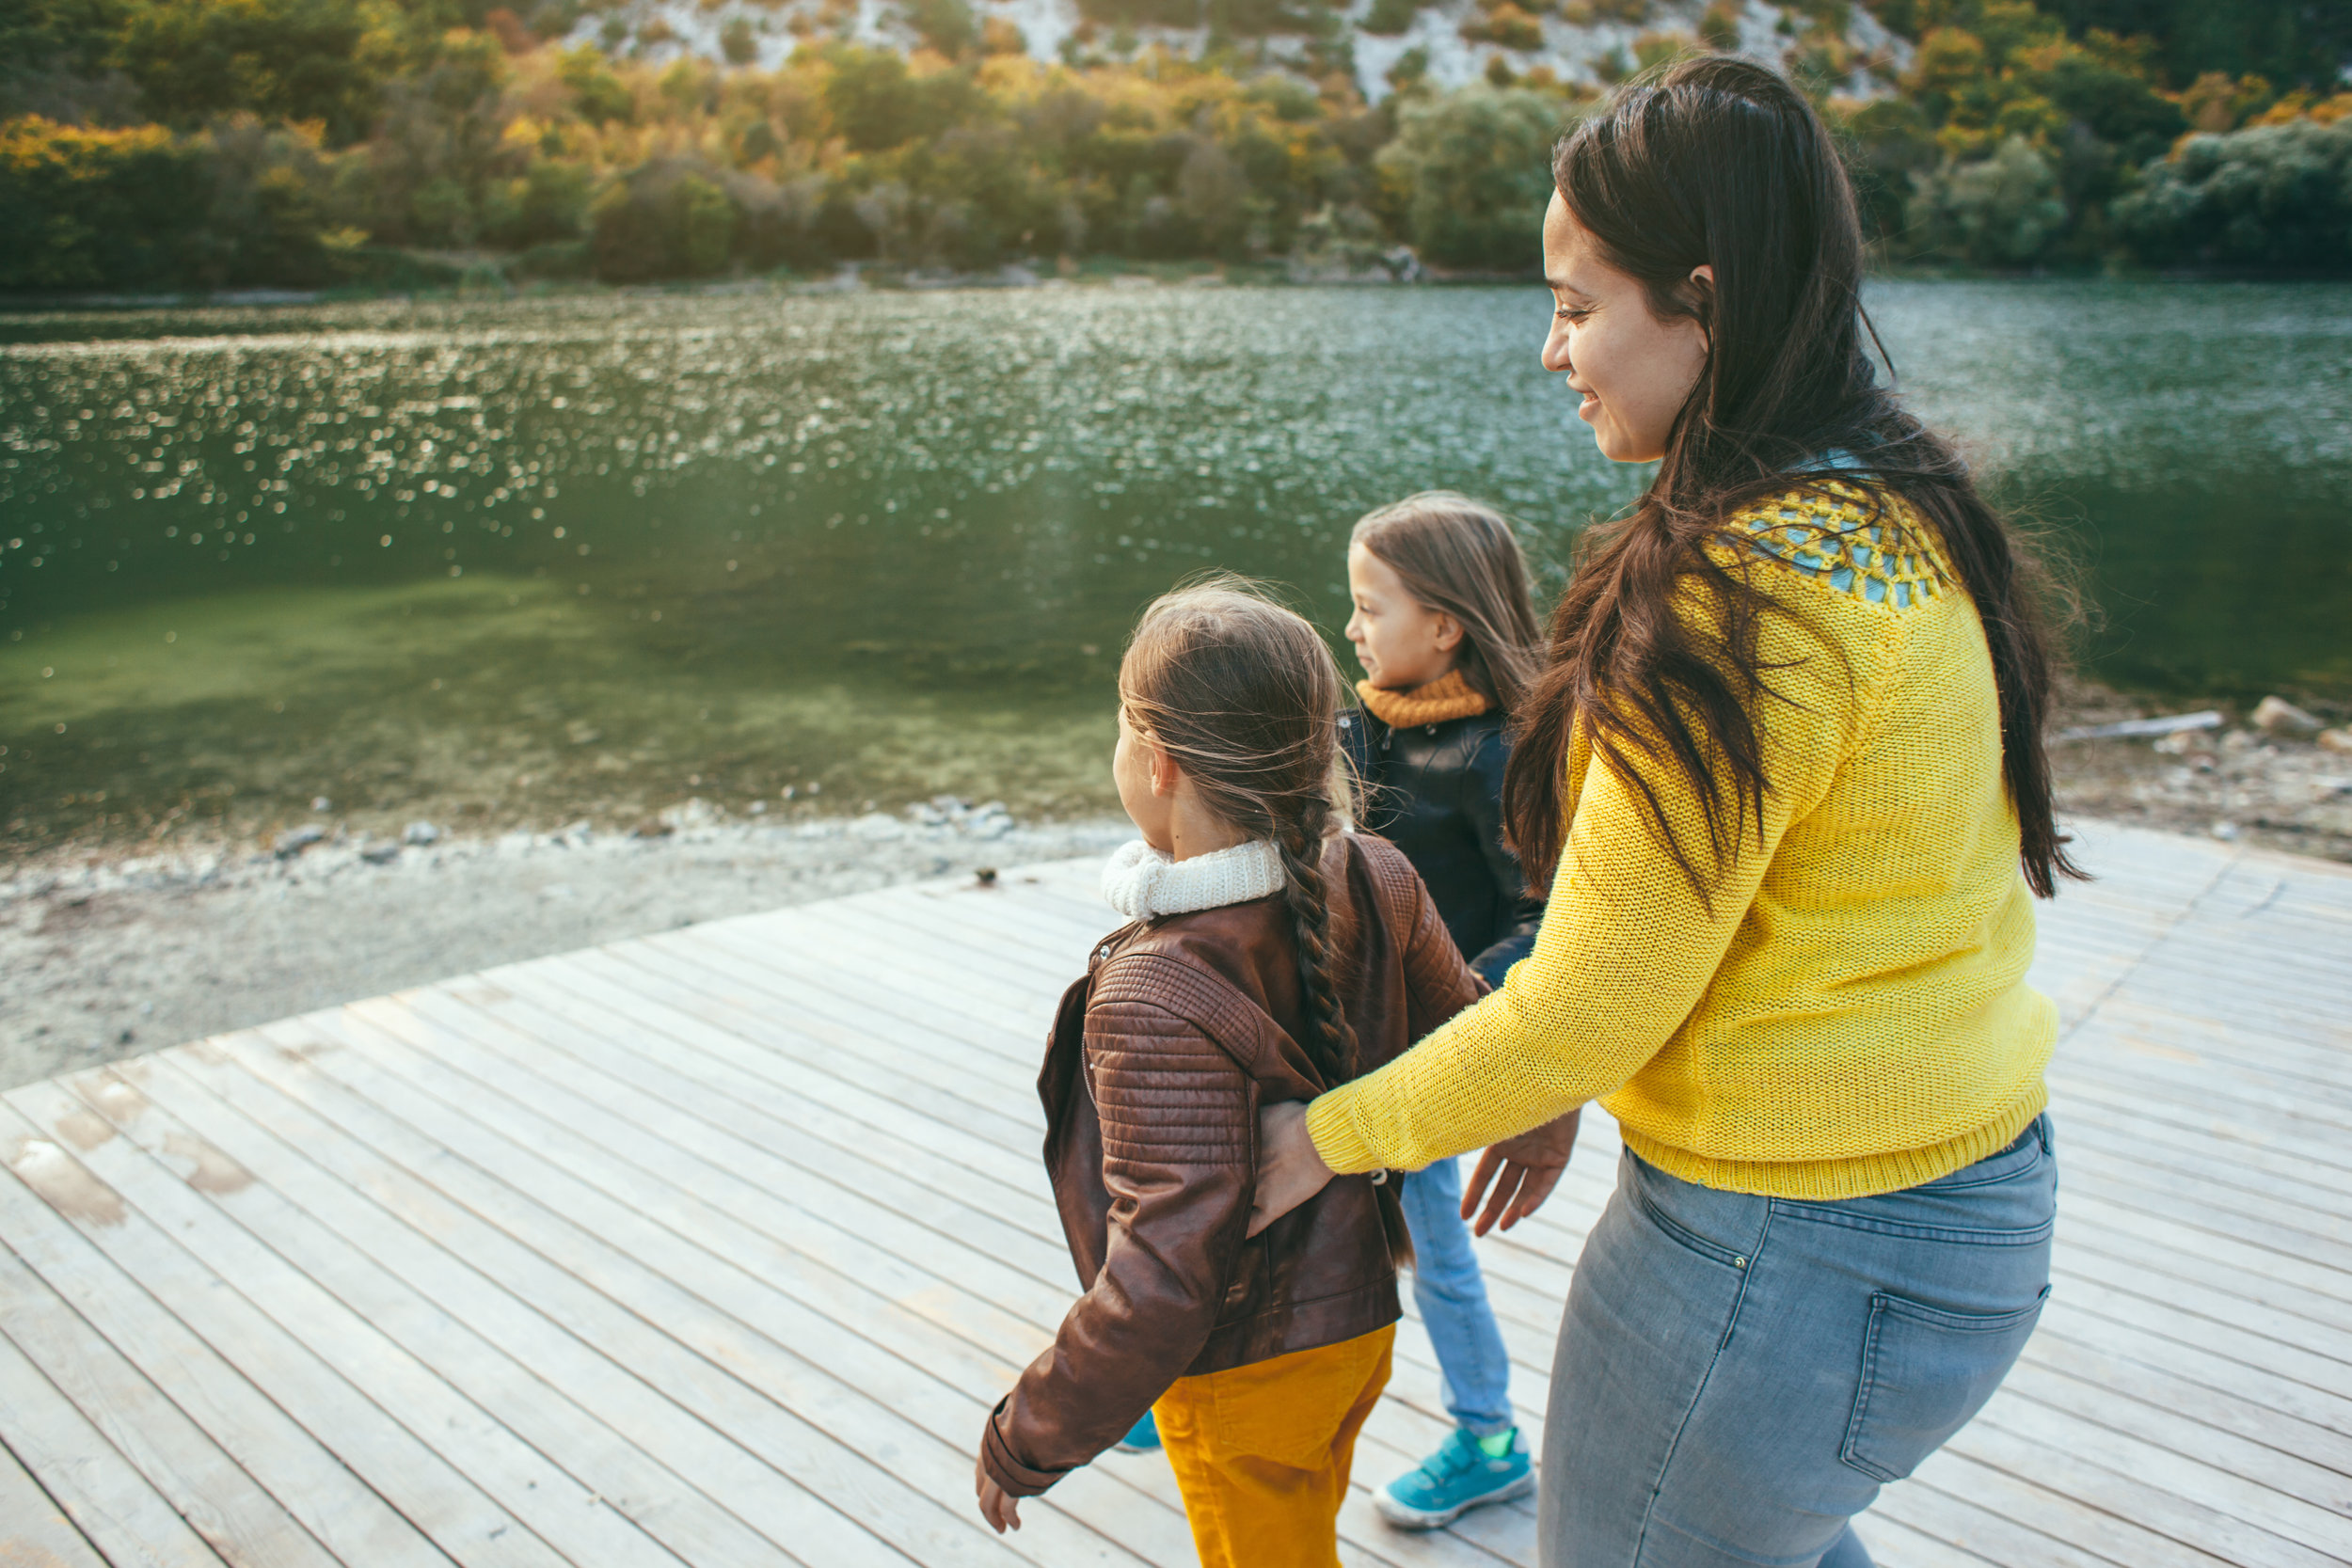 bigstock-Family-spending-time-together--208349104.jpg